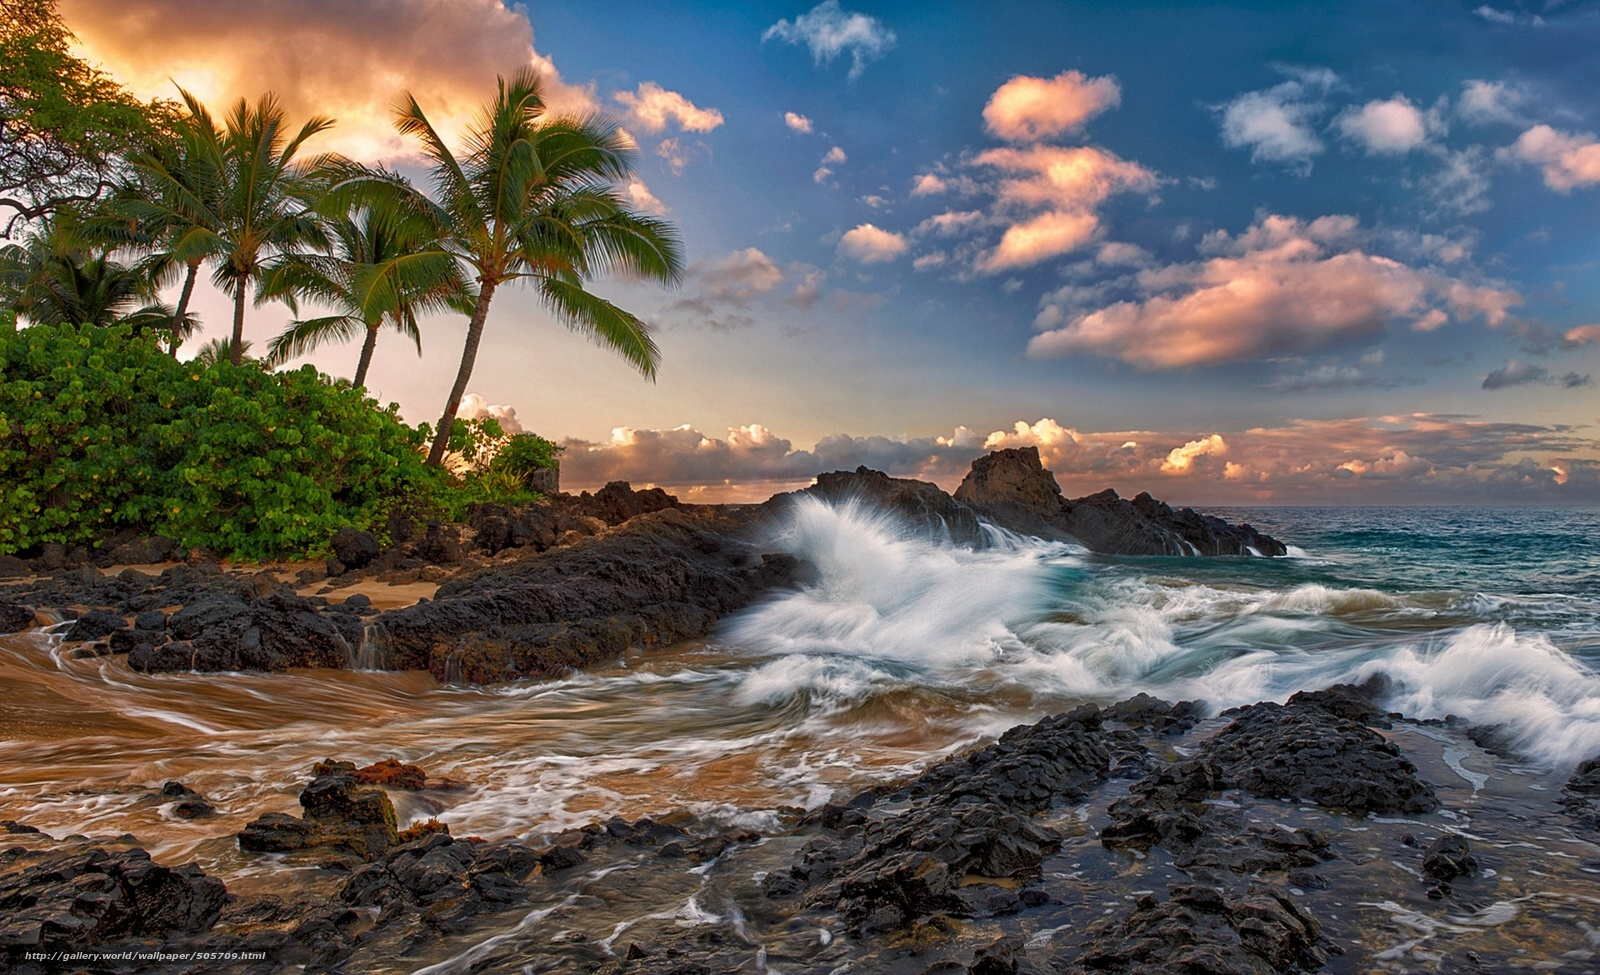 Download wallpaper maui hawaii Maui Hawaii desktop wallpaper 1600x975